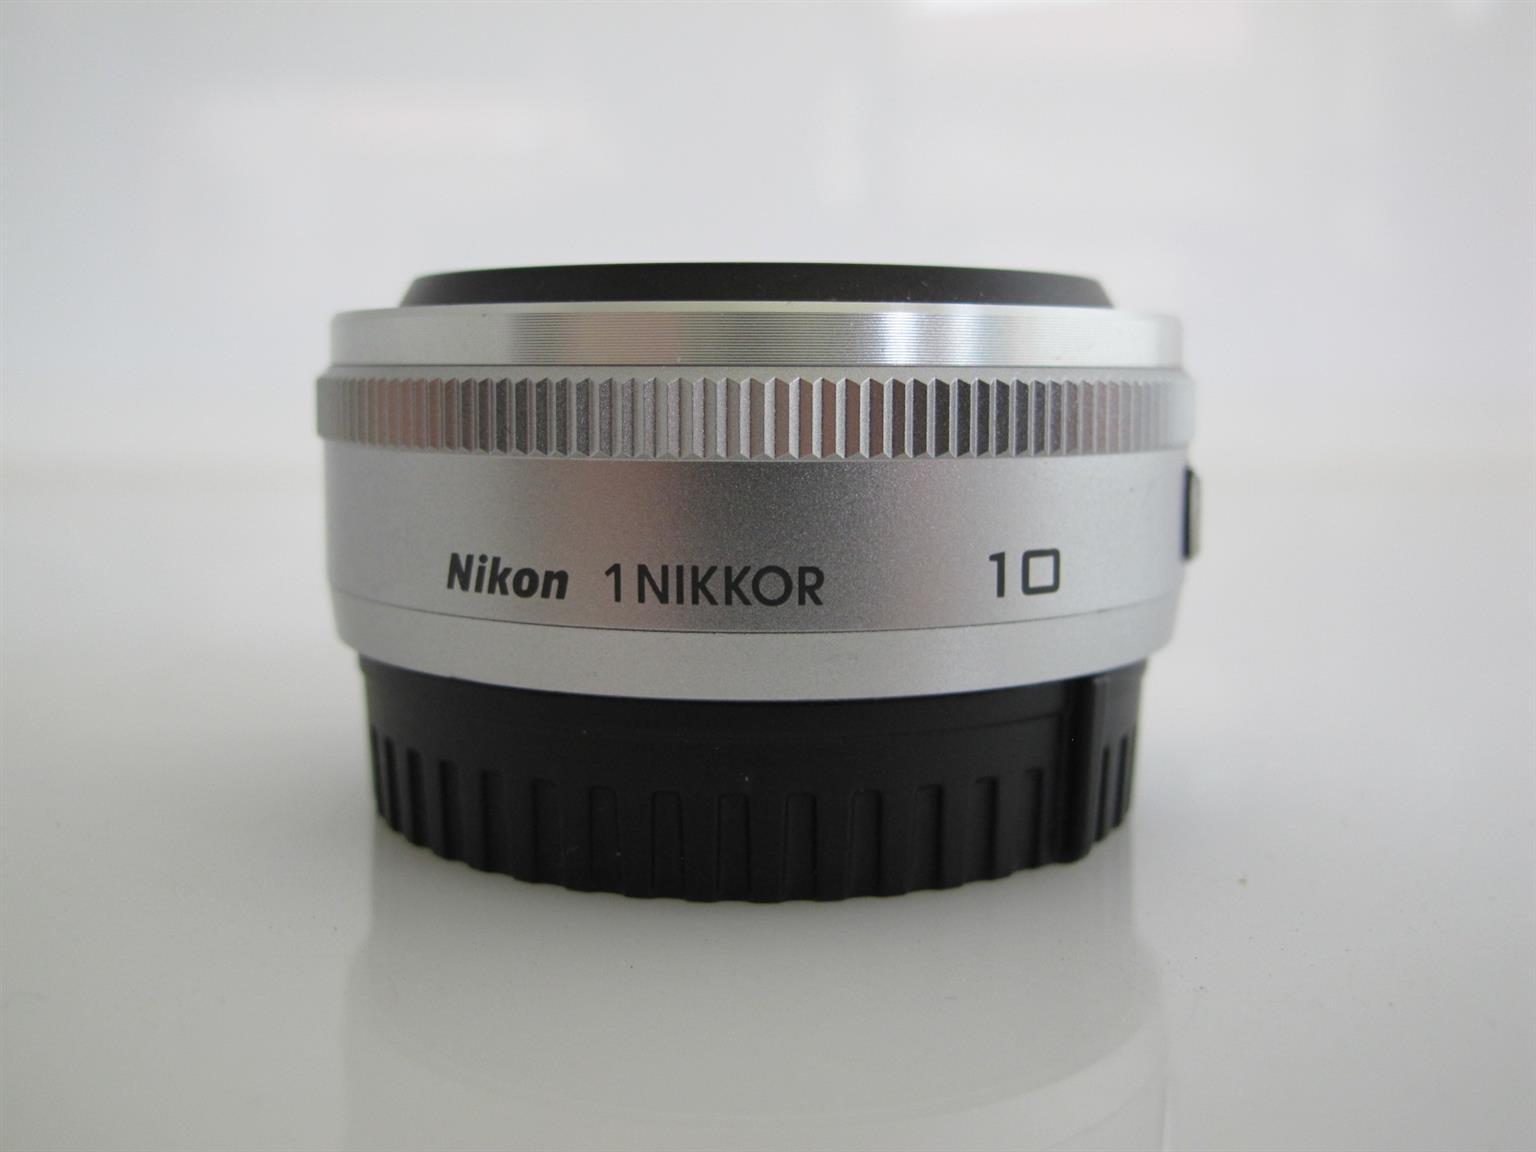 Nikon 1 Nikkor 10mm f2.8 lens for Nikon 1 Series Mirroless Digital cameras